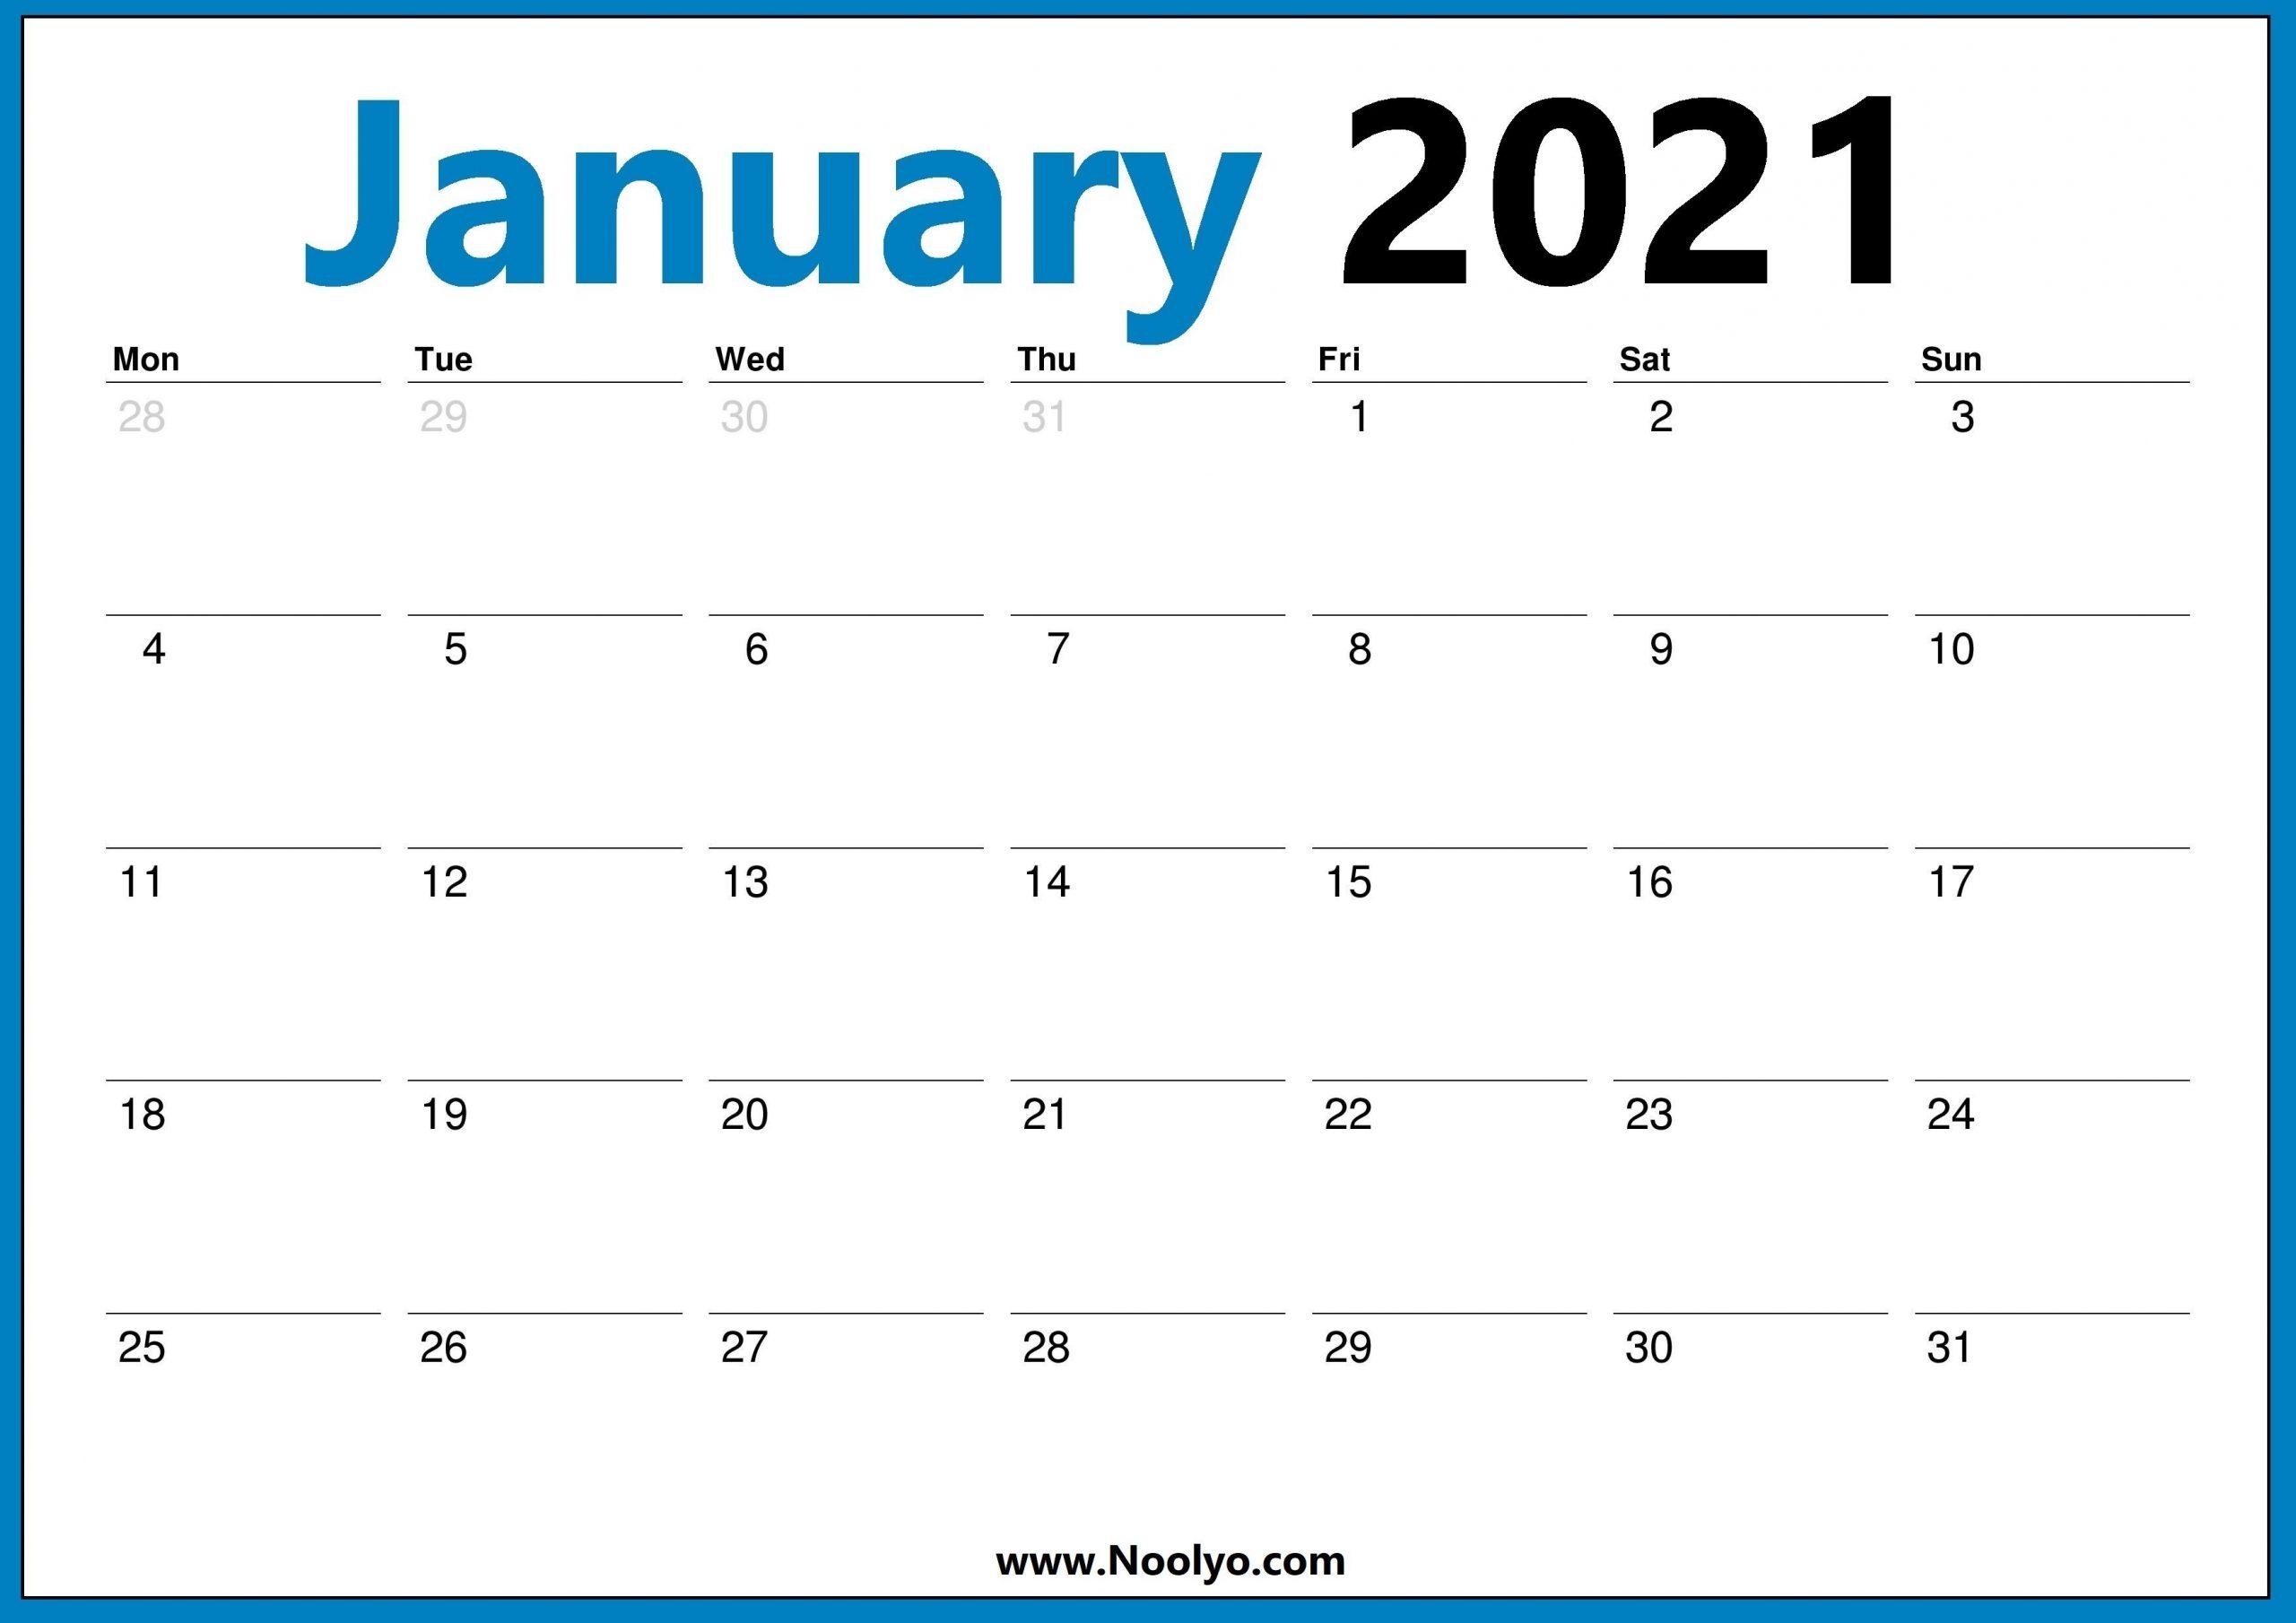 January 2021 Calendar Monday Start Noolyo